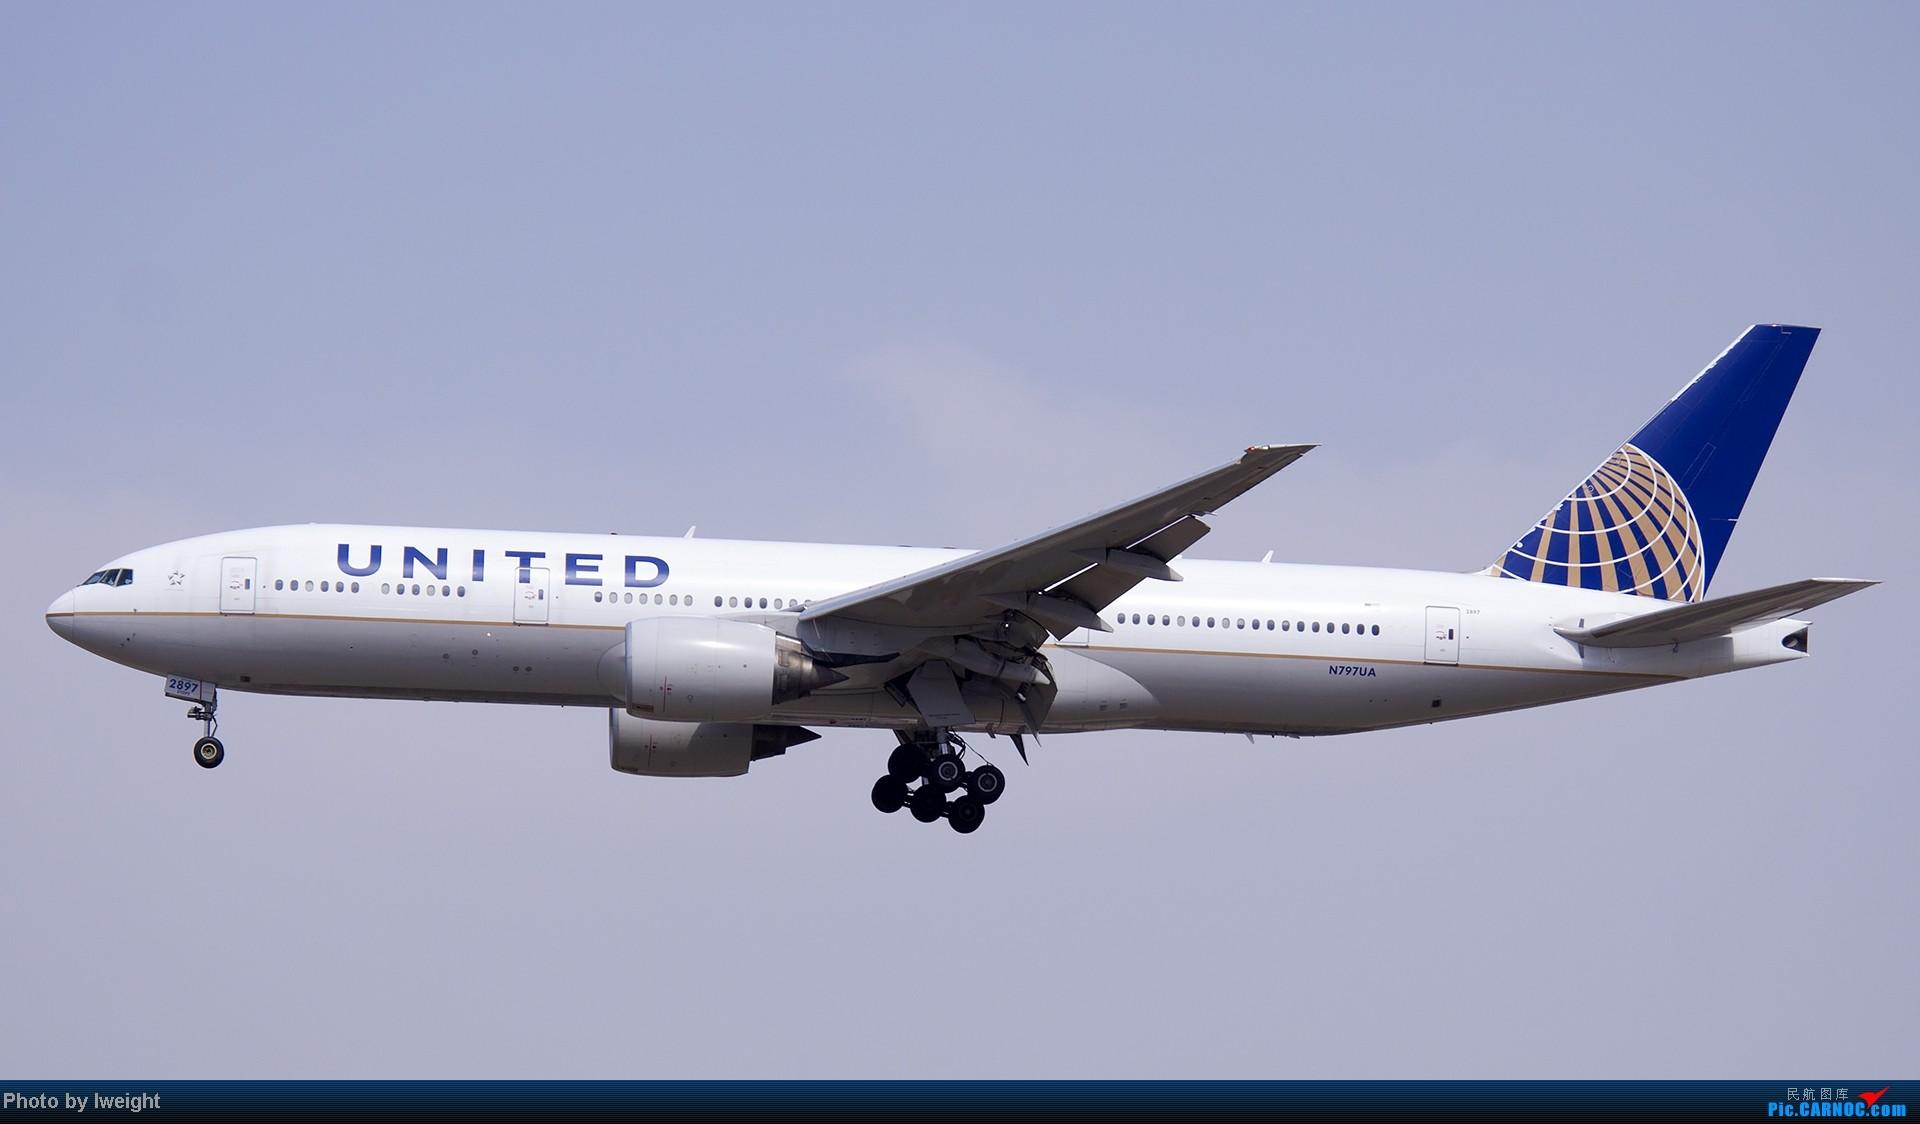 Re:[原创]5月3日首都机场风云变幻的下午 BOEING 777-200 N797UA 中国北京首都机场